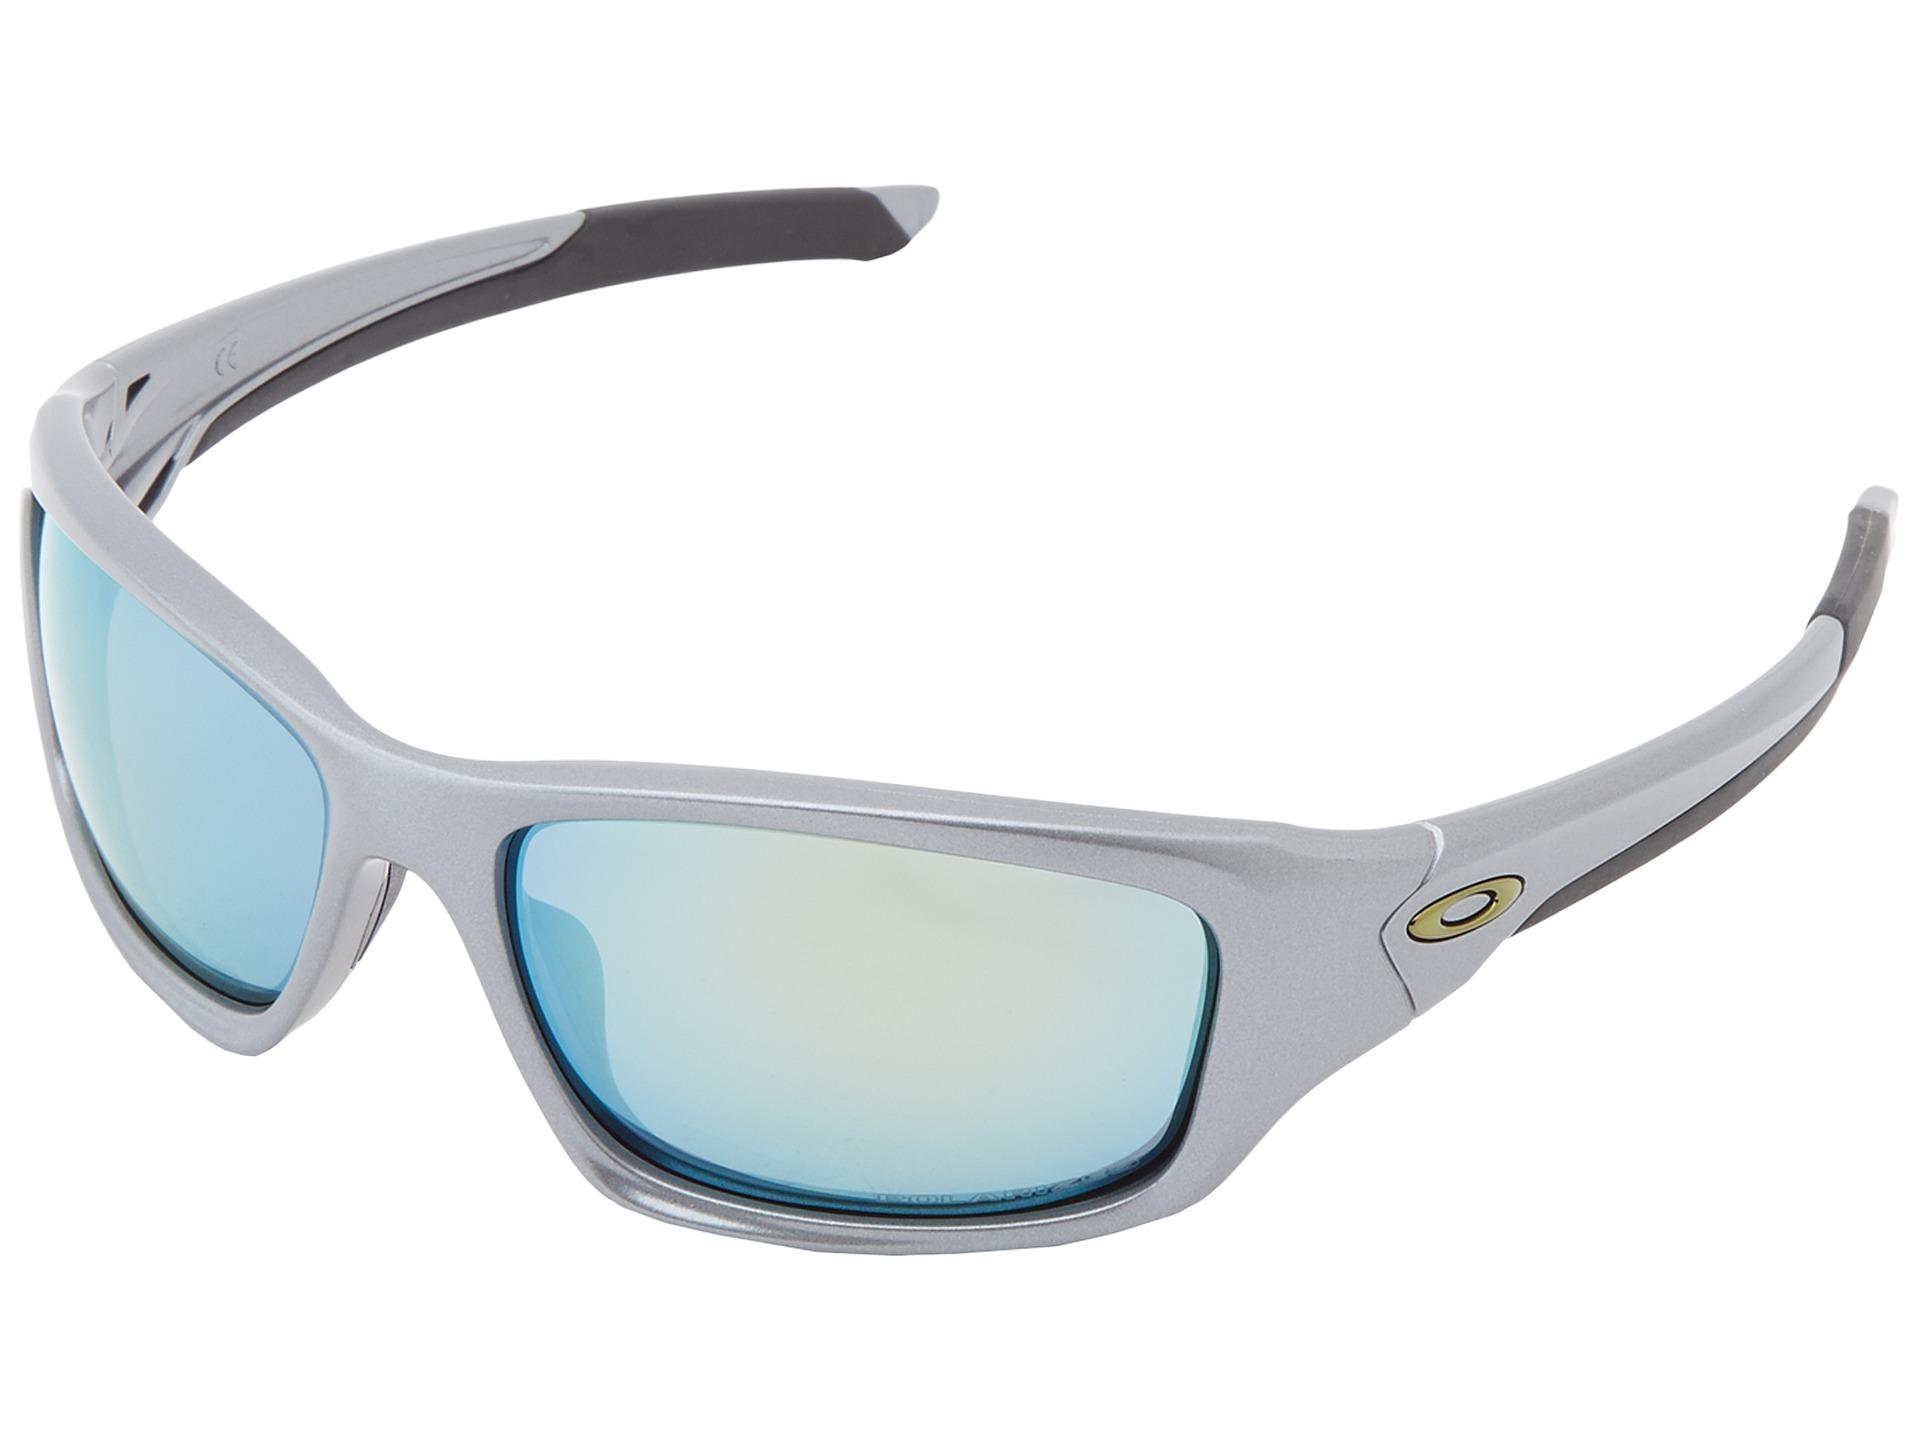 oakley ansi approved safety glasses pnp8  oakley ansi rated